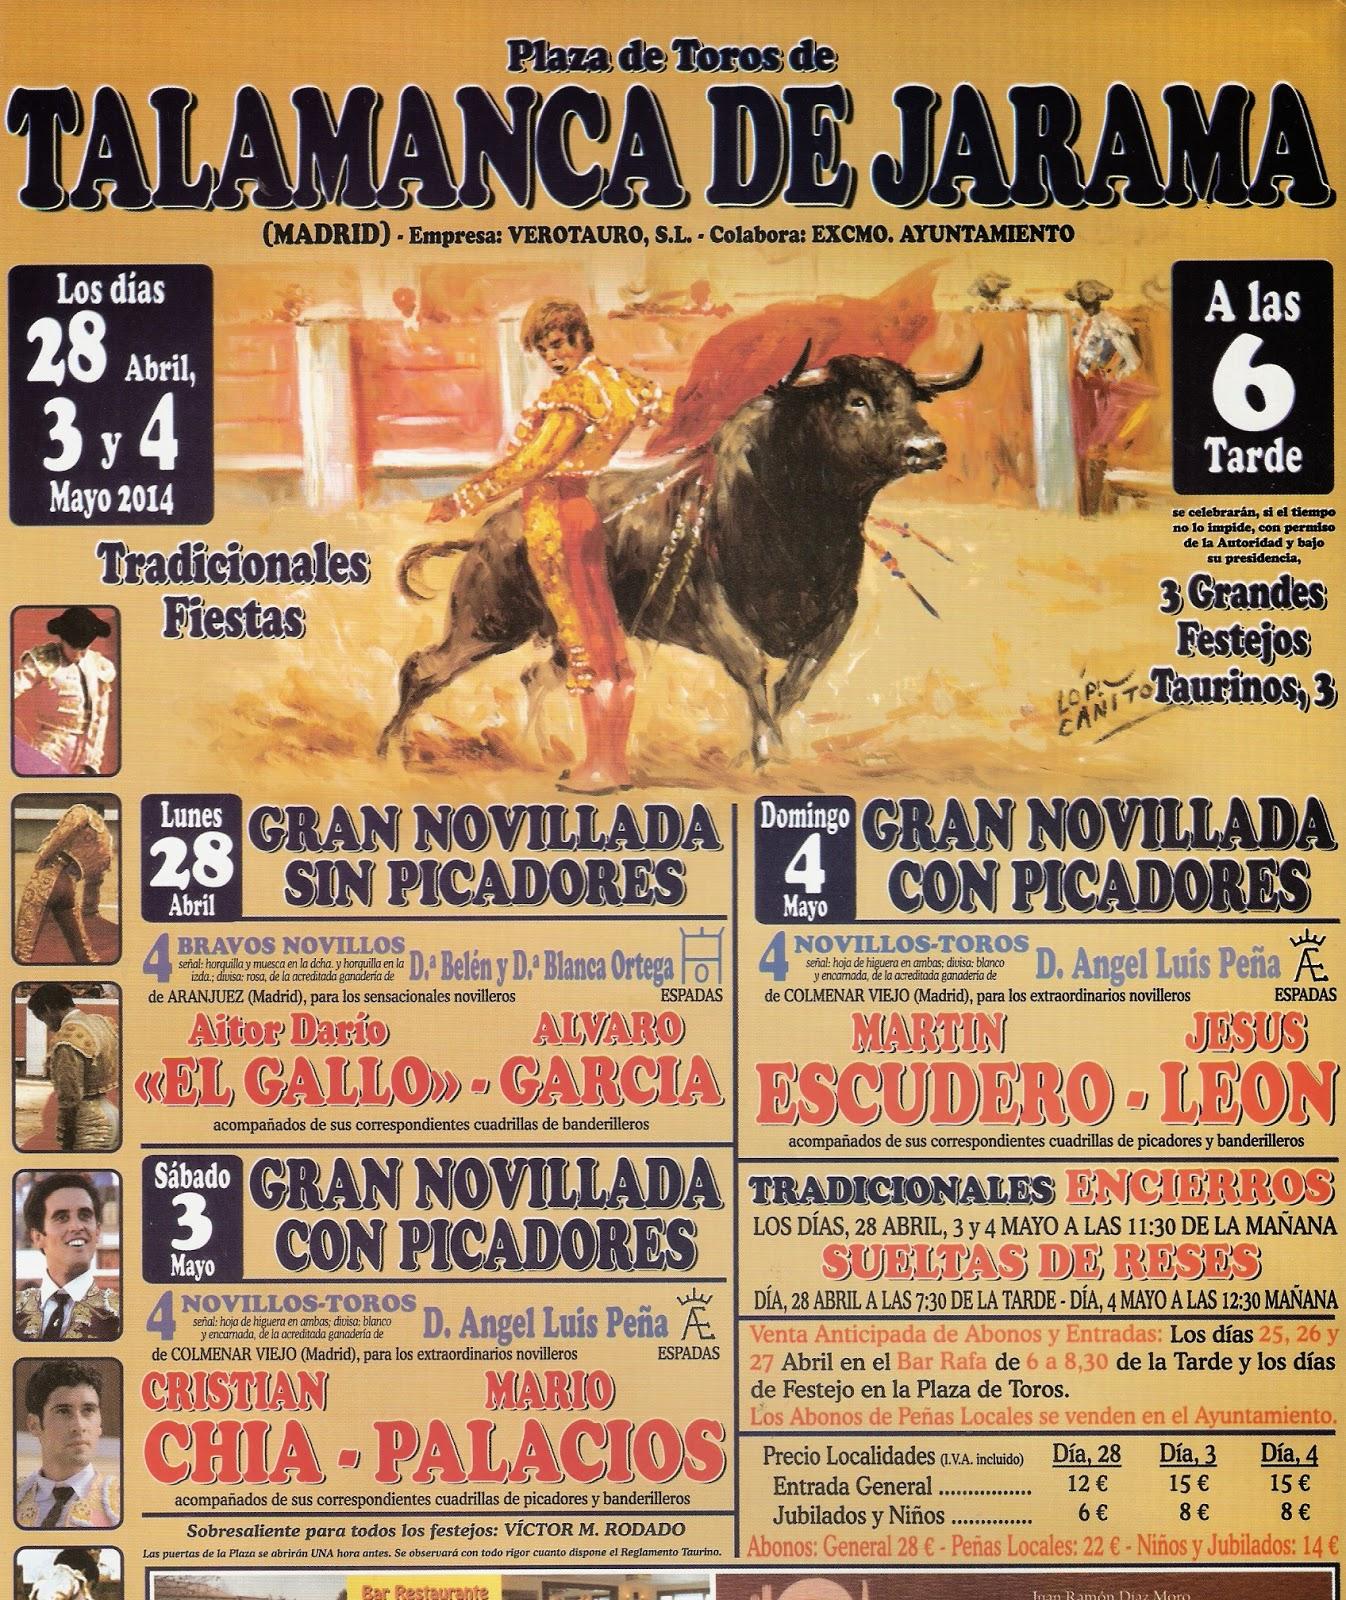 Talamanca de Jarama 2014